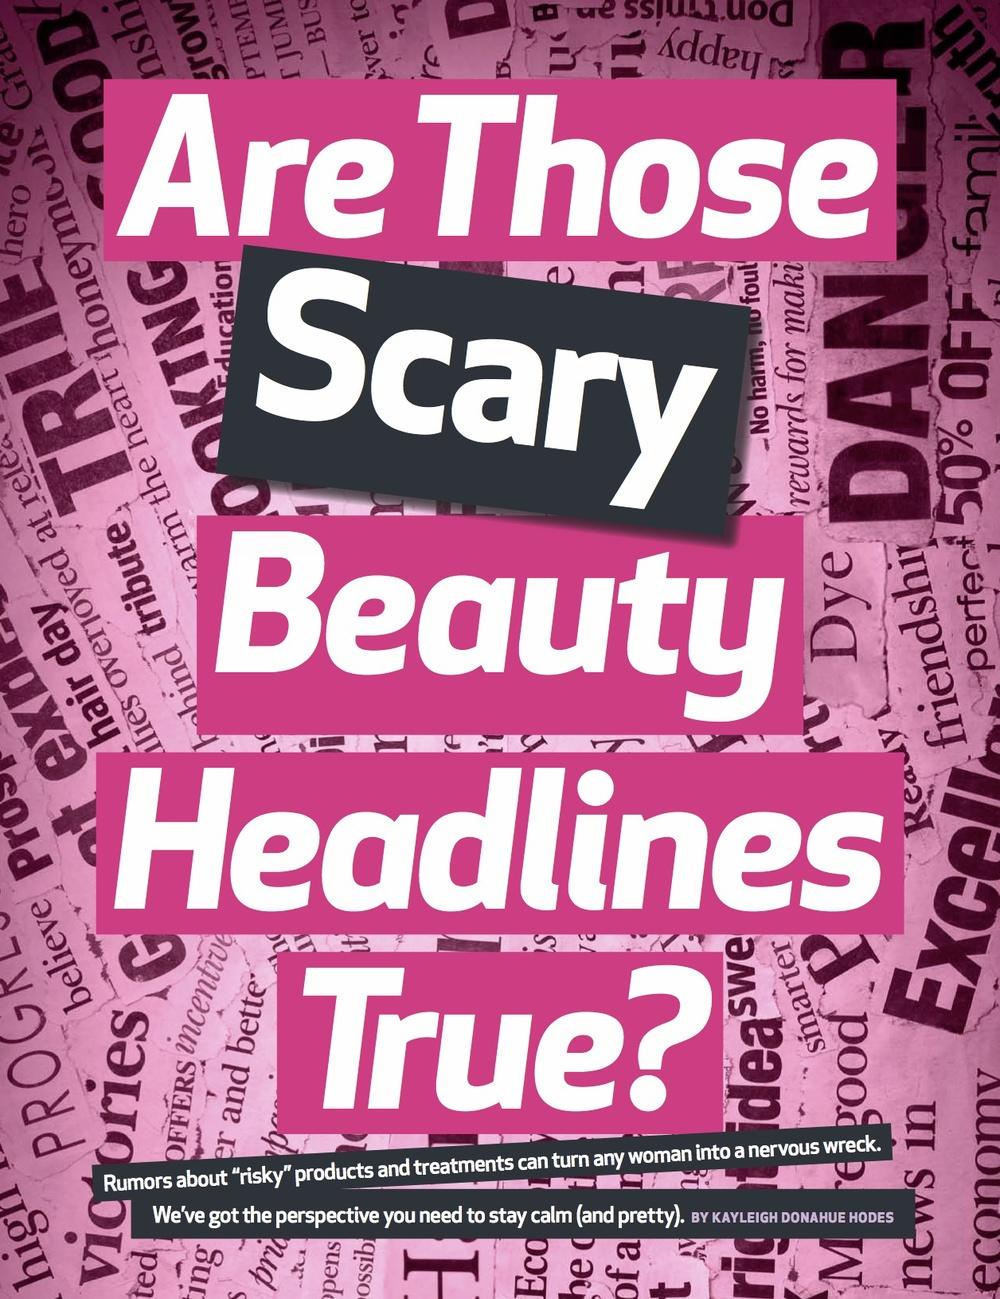 BeautyHeadlines copy 1.jpg